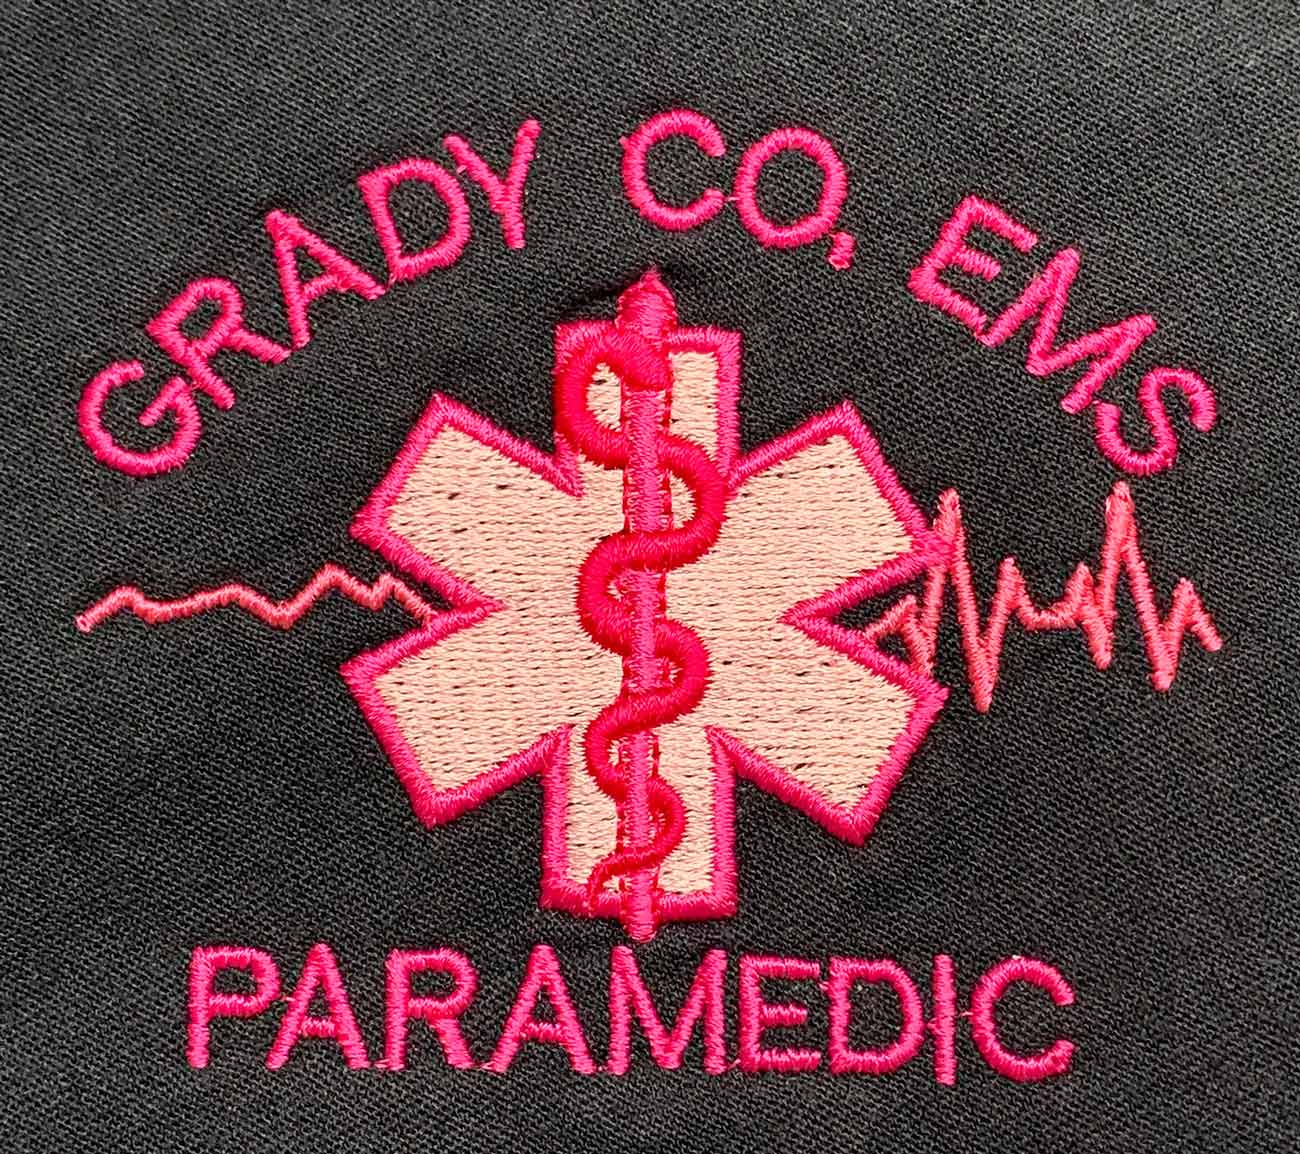 KYC_GRADY-CO-EMS-PARAMEDIC_web.jpg